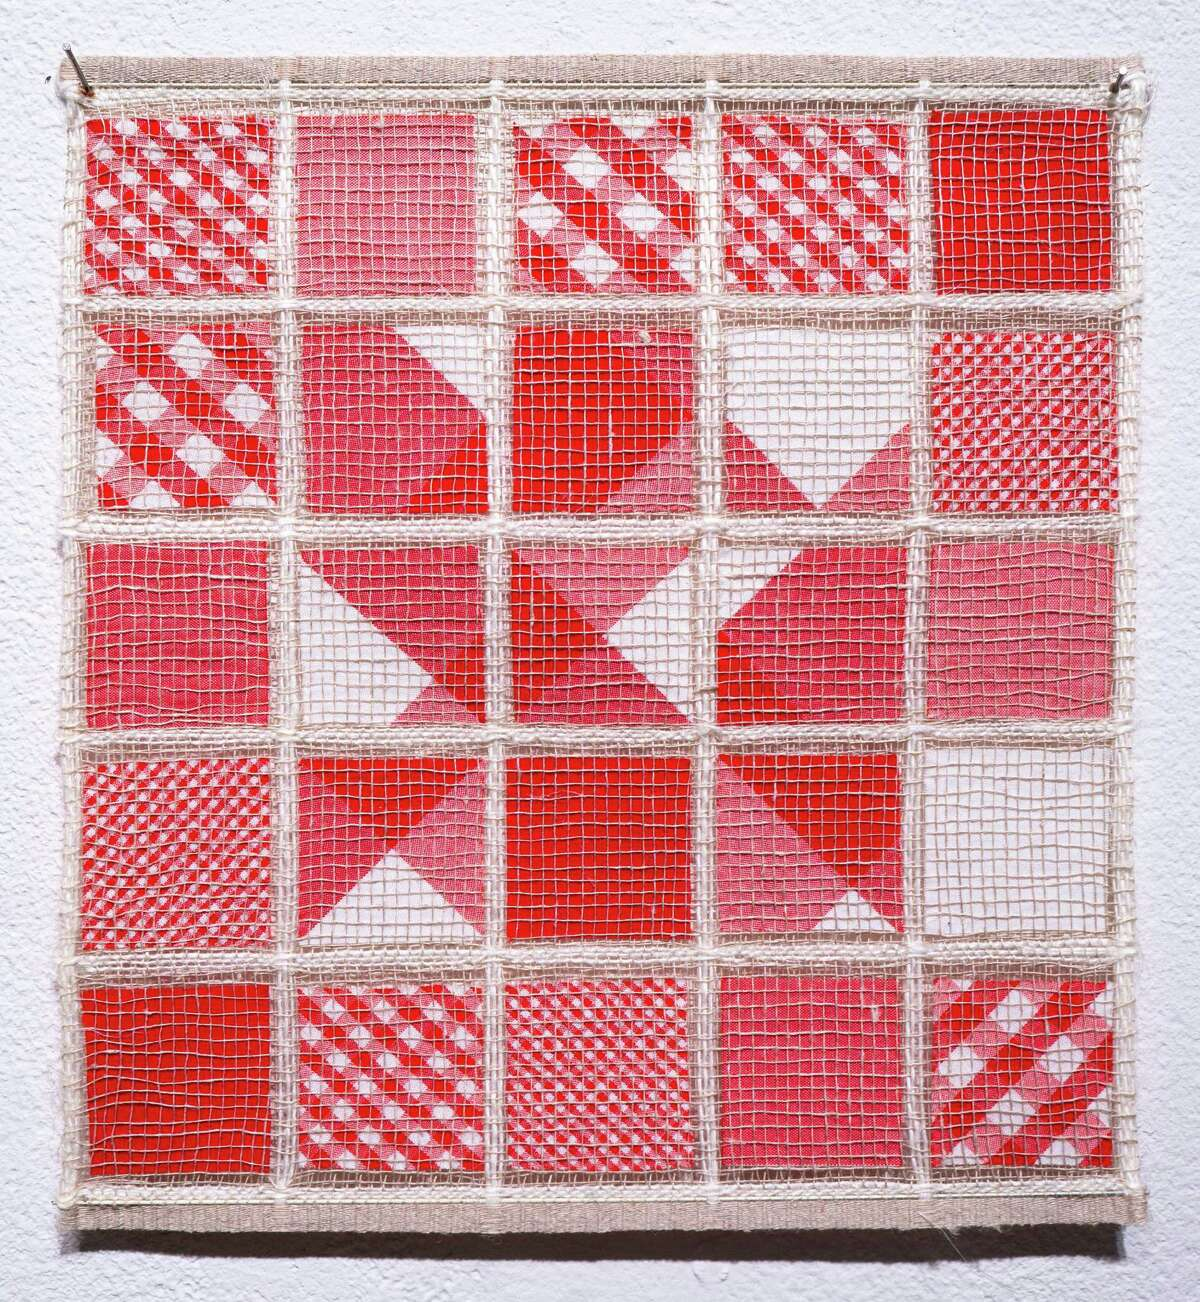 Hiroko Ote, Sealed Gingham Check A, 2001. Linen, cotton. Photo Wm Jaeger